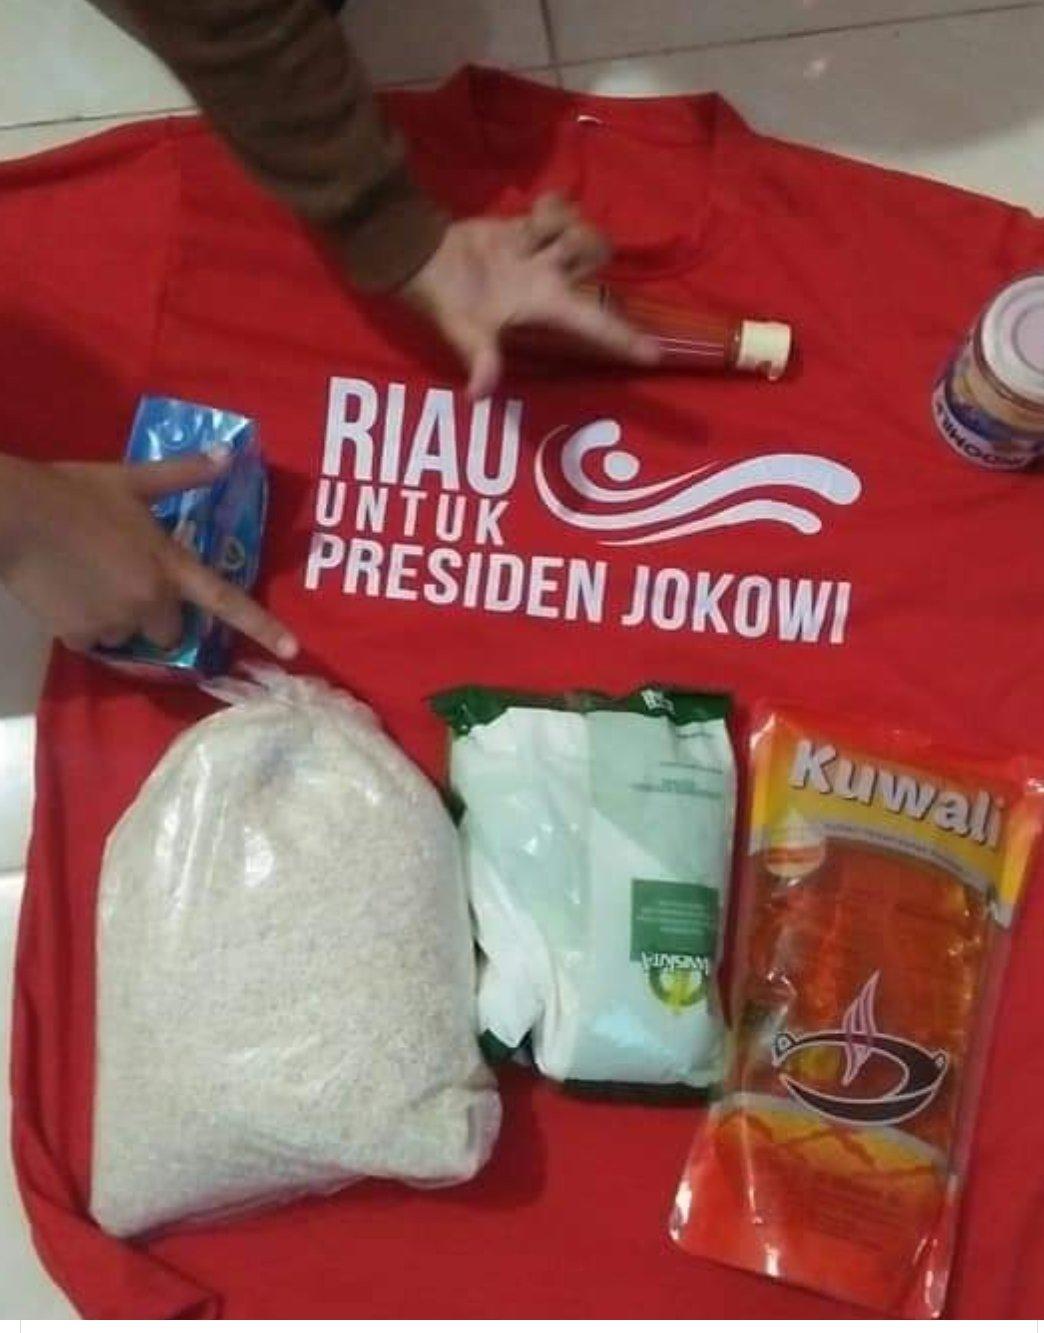 Temukan Ini di Riau, KH Tengku Zulkarnain: Mulai Nyuap!?